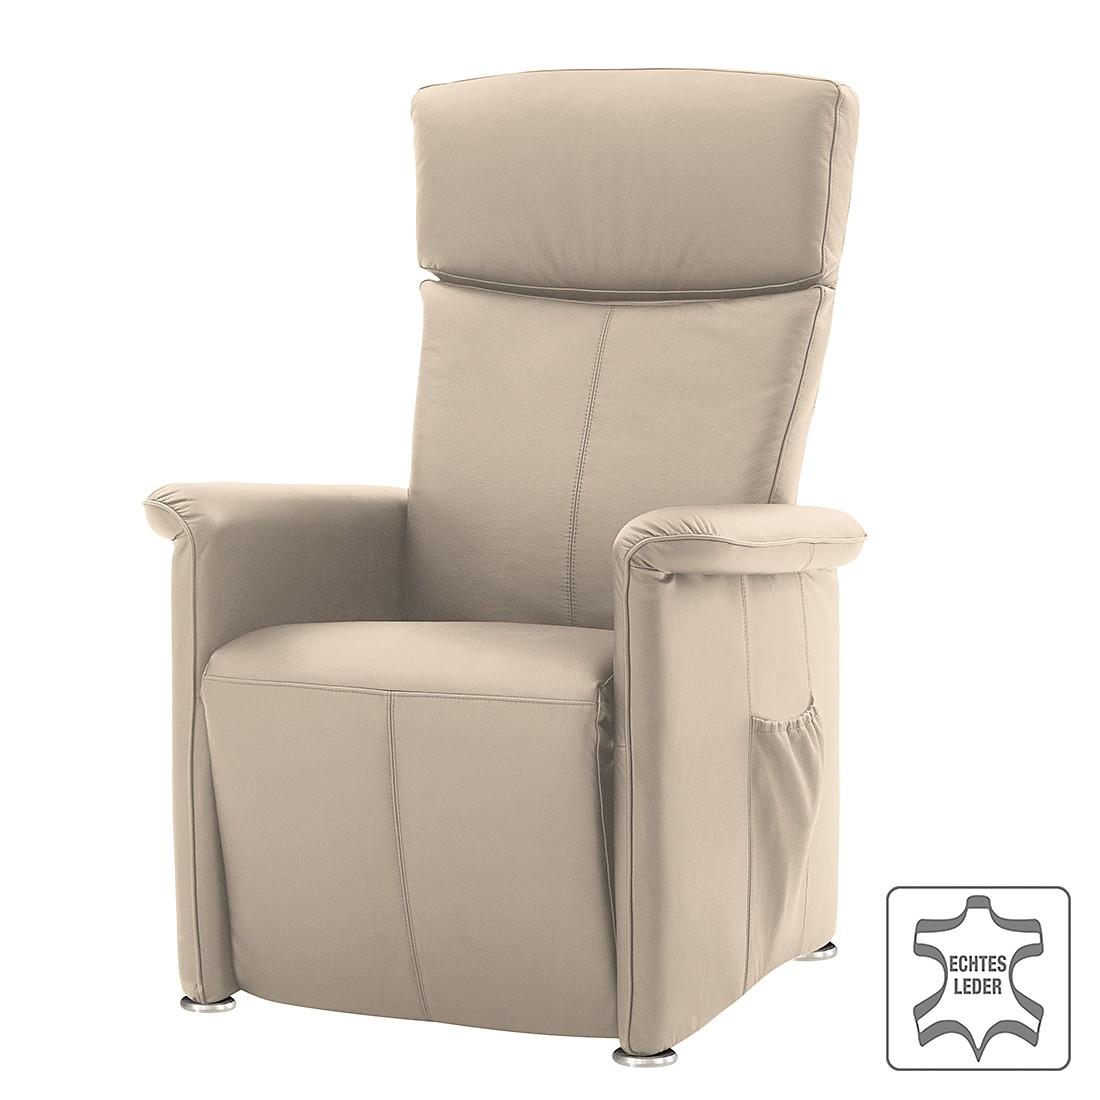 massagesessel broderick echtleder mechanische verstellung beige nuovoform g nstig online. Black Bedroom Furniture Sets. Home Design Ideas